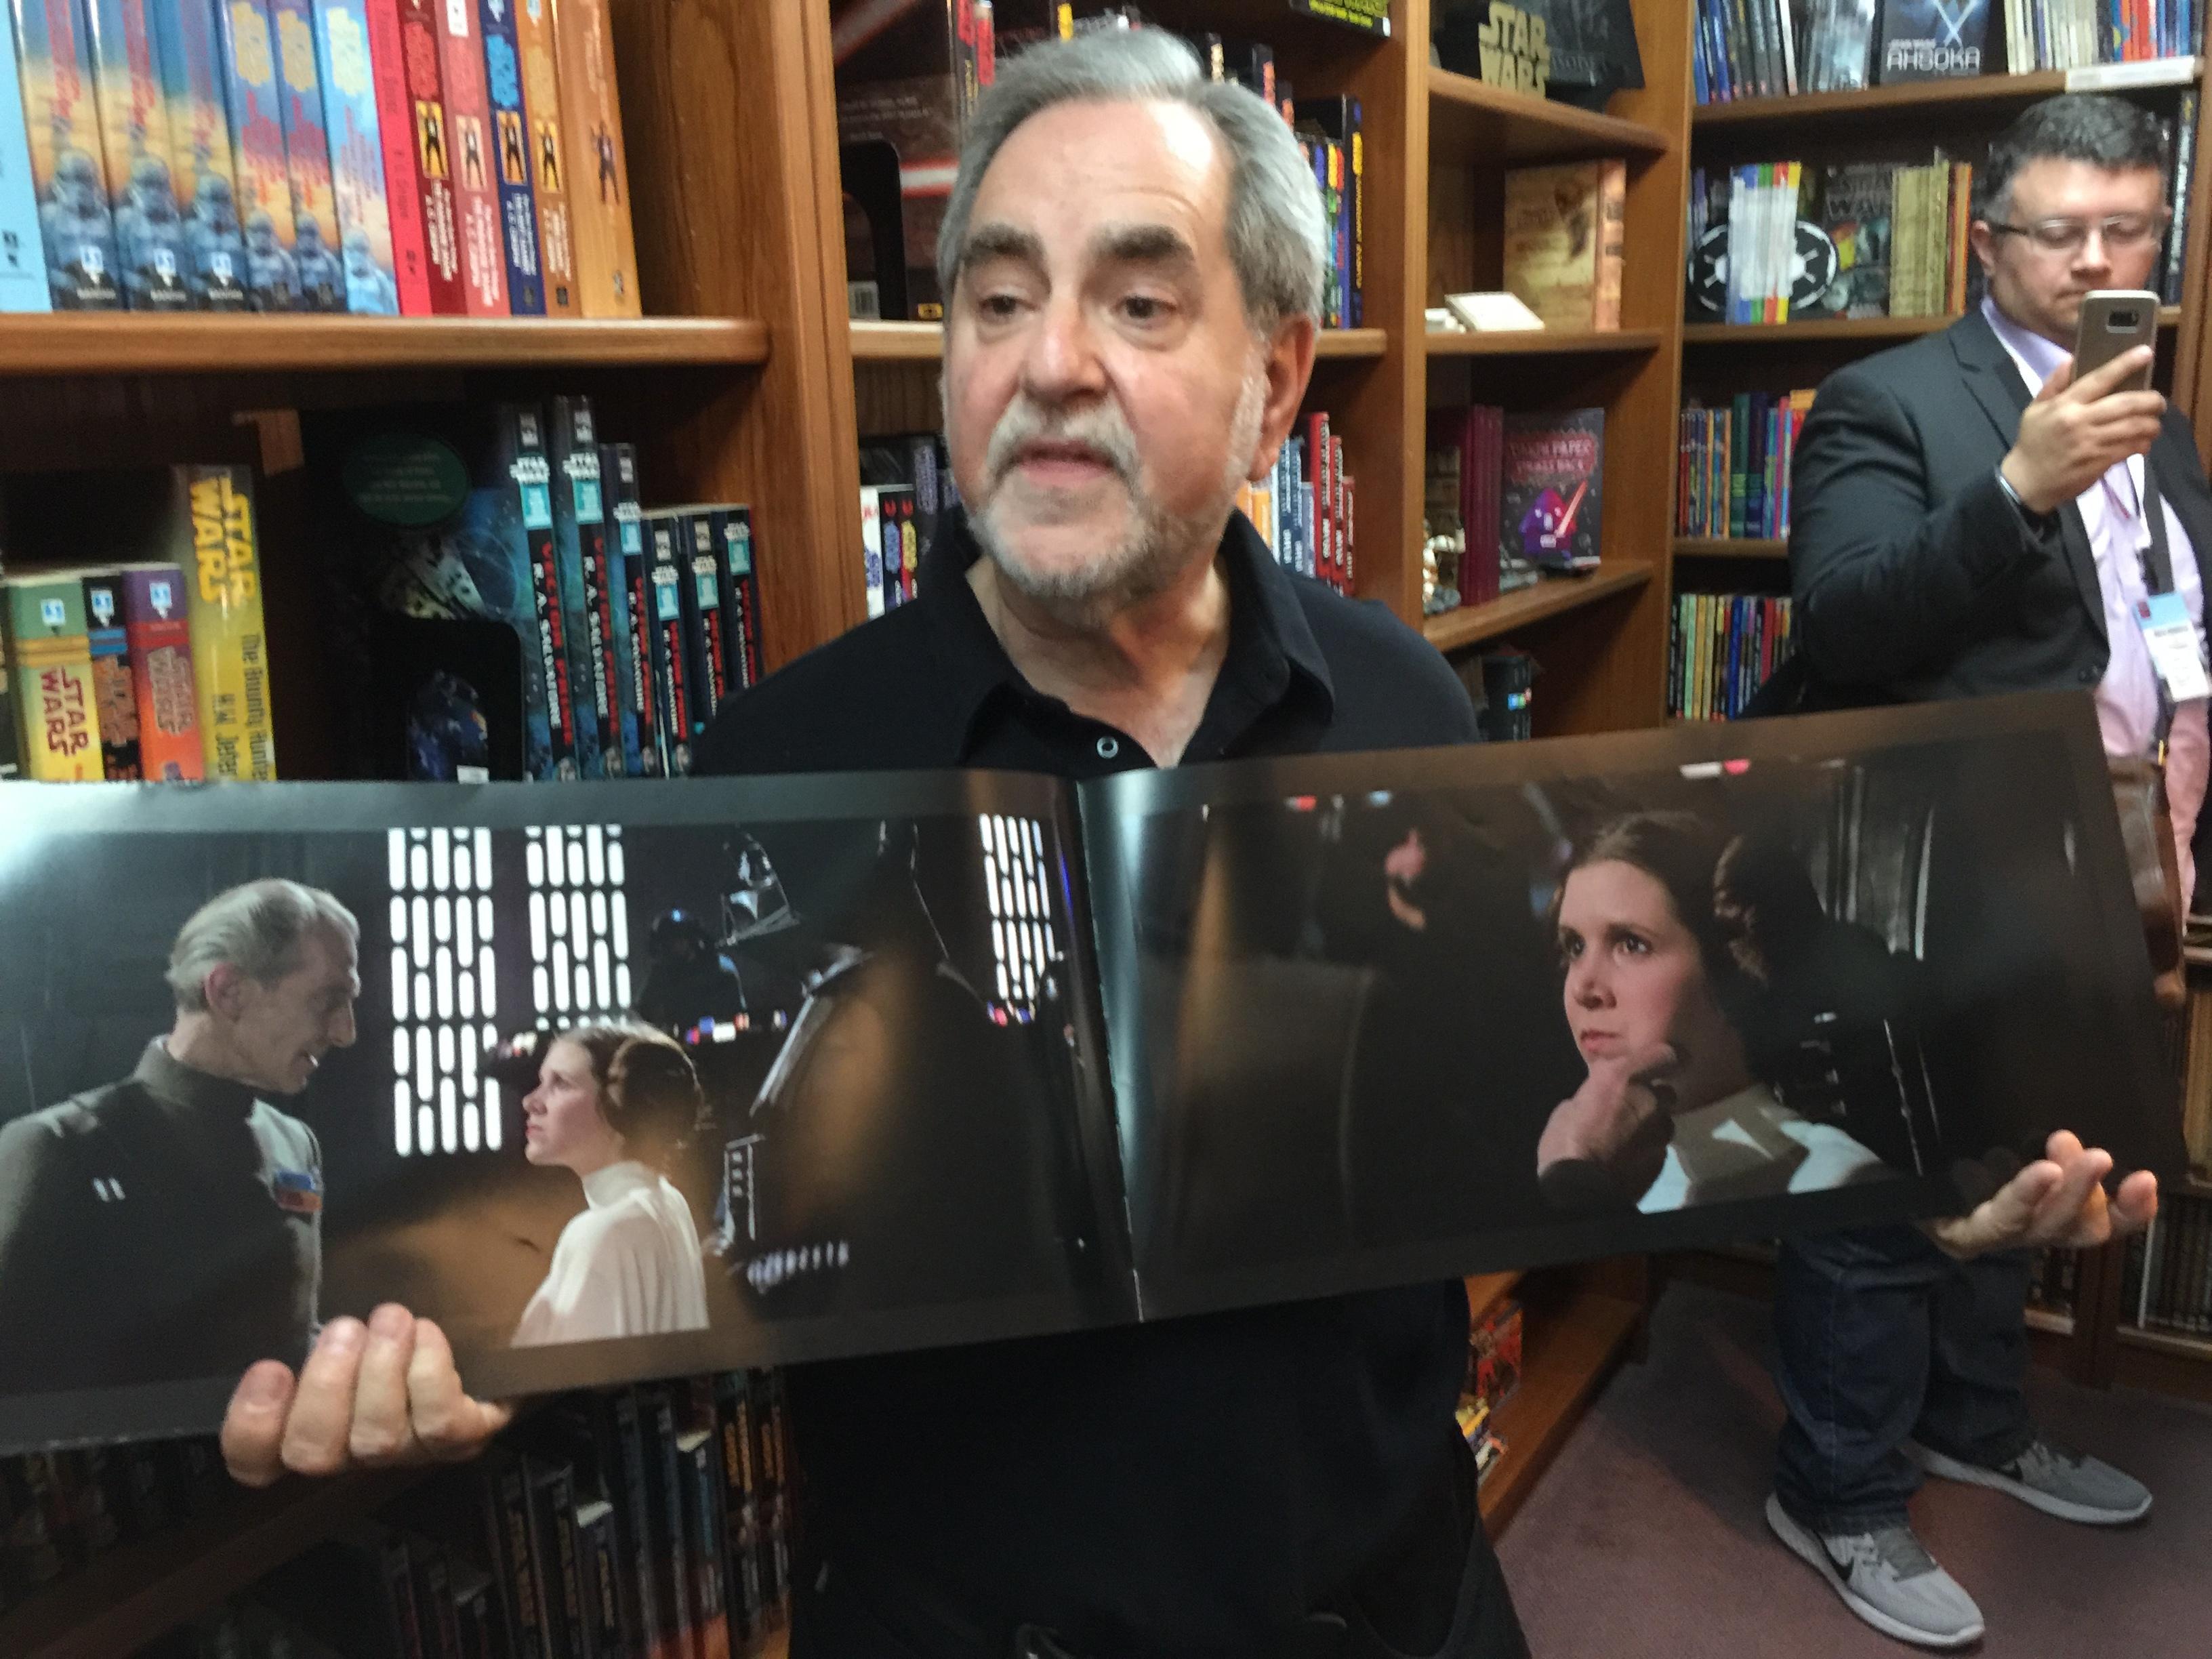 Rancho Obi-Wan founder Steve Sansweet.